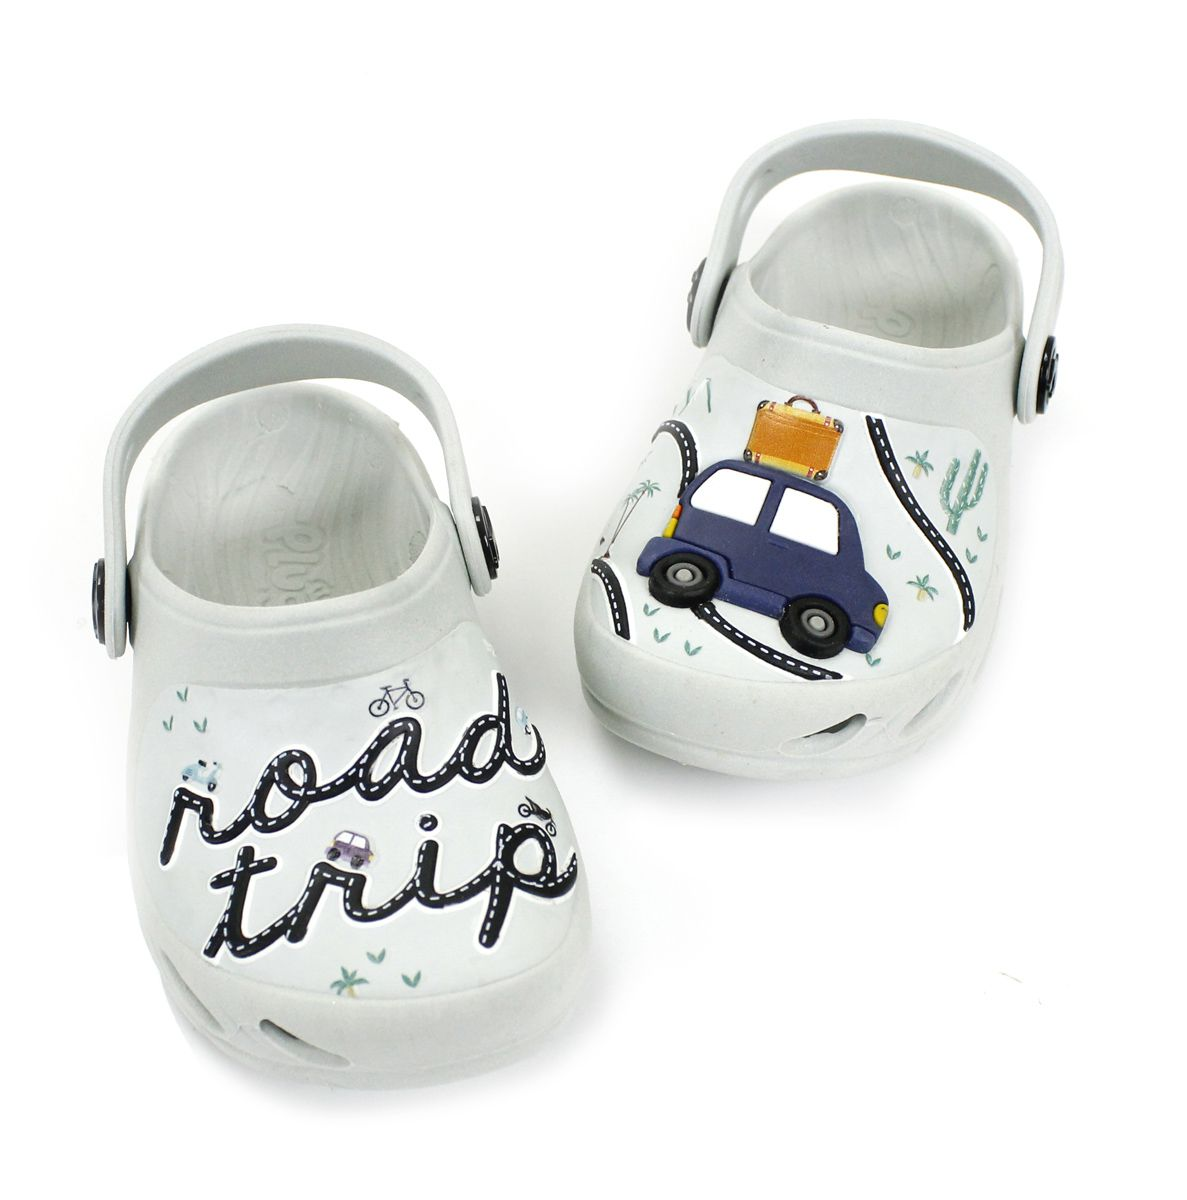 Babuche Plugt Carro Ventor Road Trip